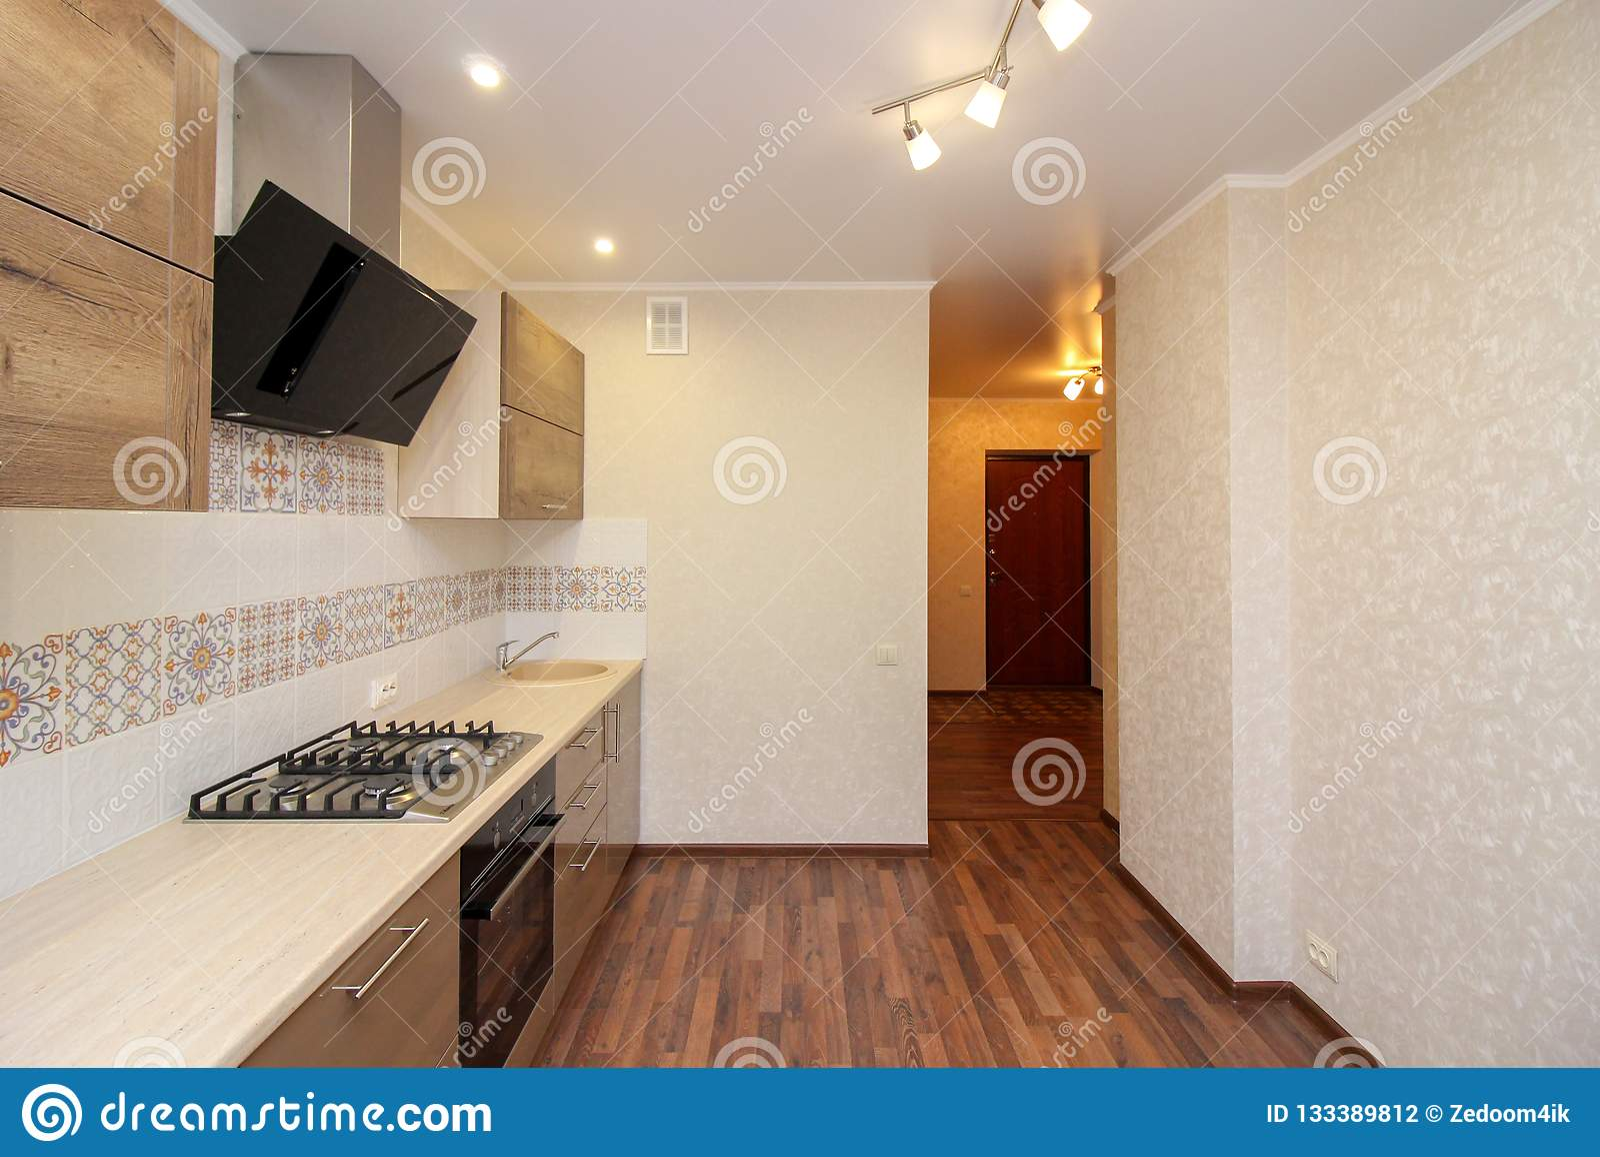 Lampade Per Cucine Moderne.Cucina Moderna Con Le Lampade Moderne Fotografia Stock